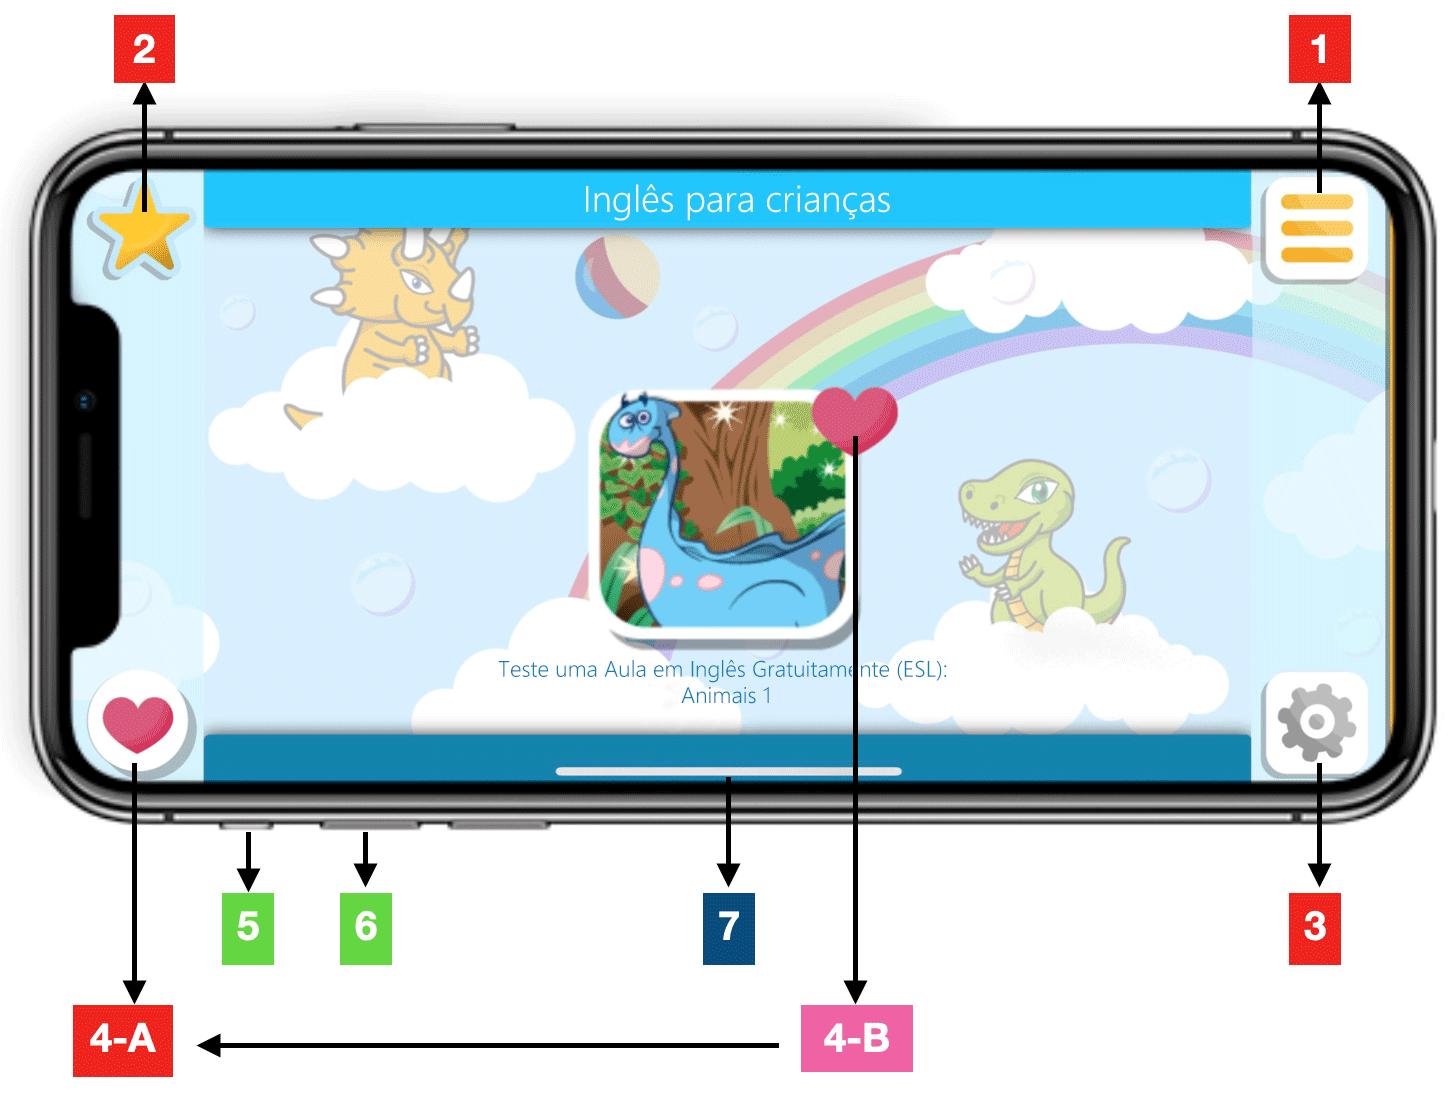 dinolingo-app-instructions-pt